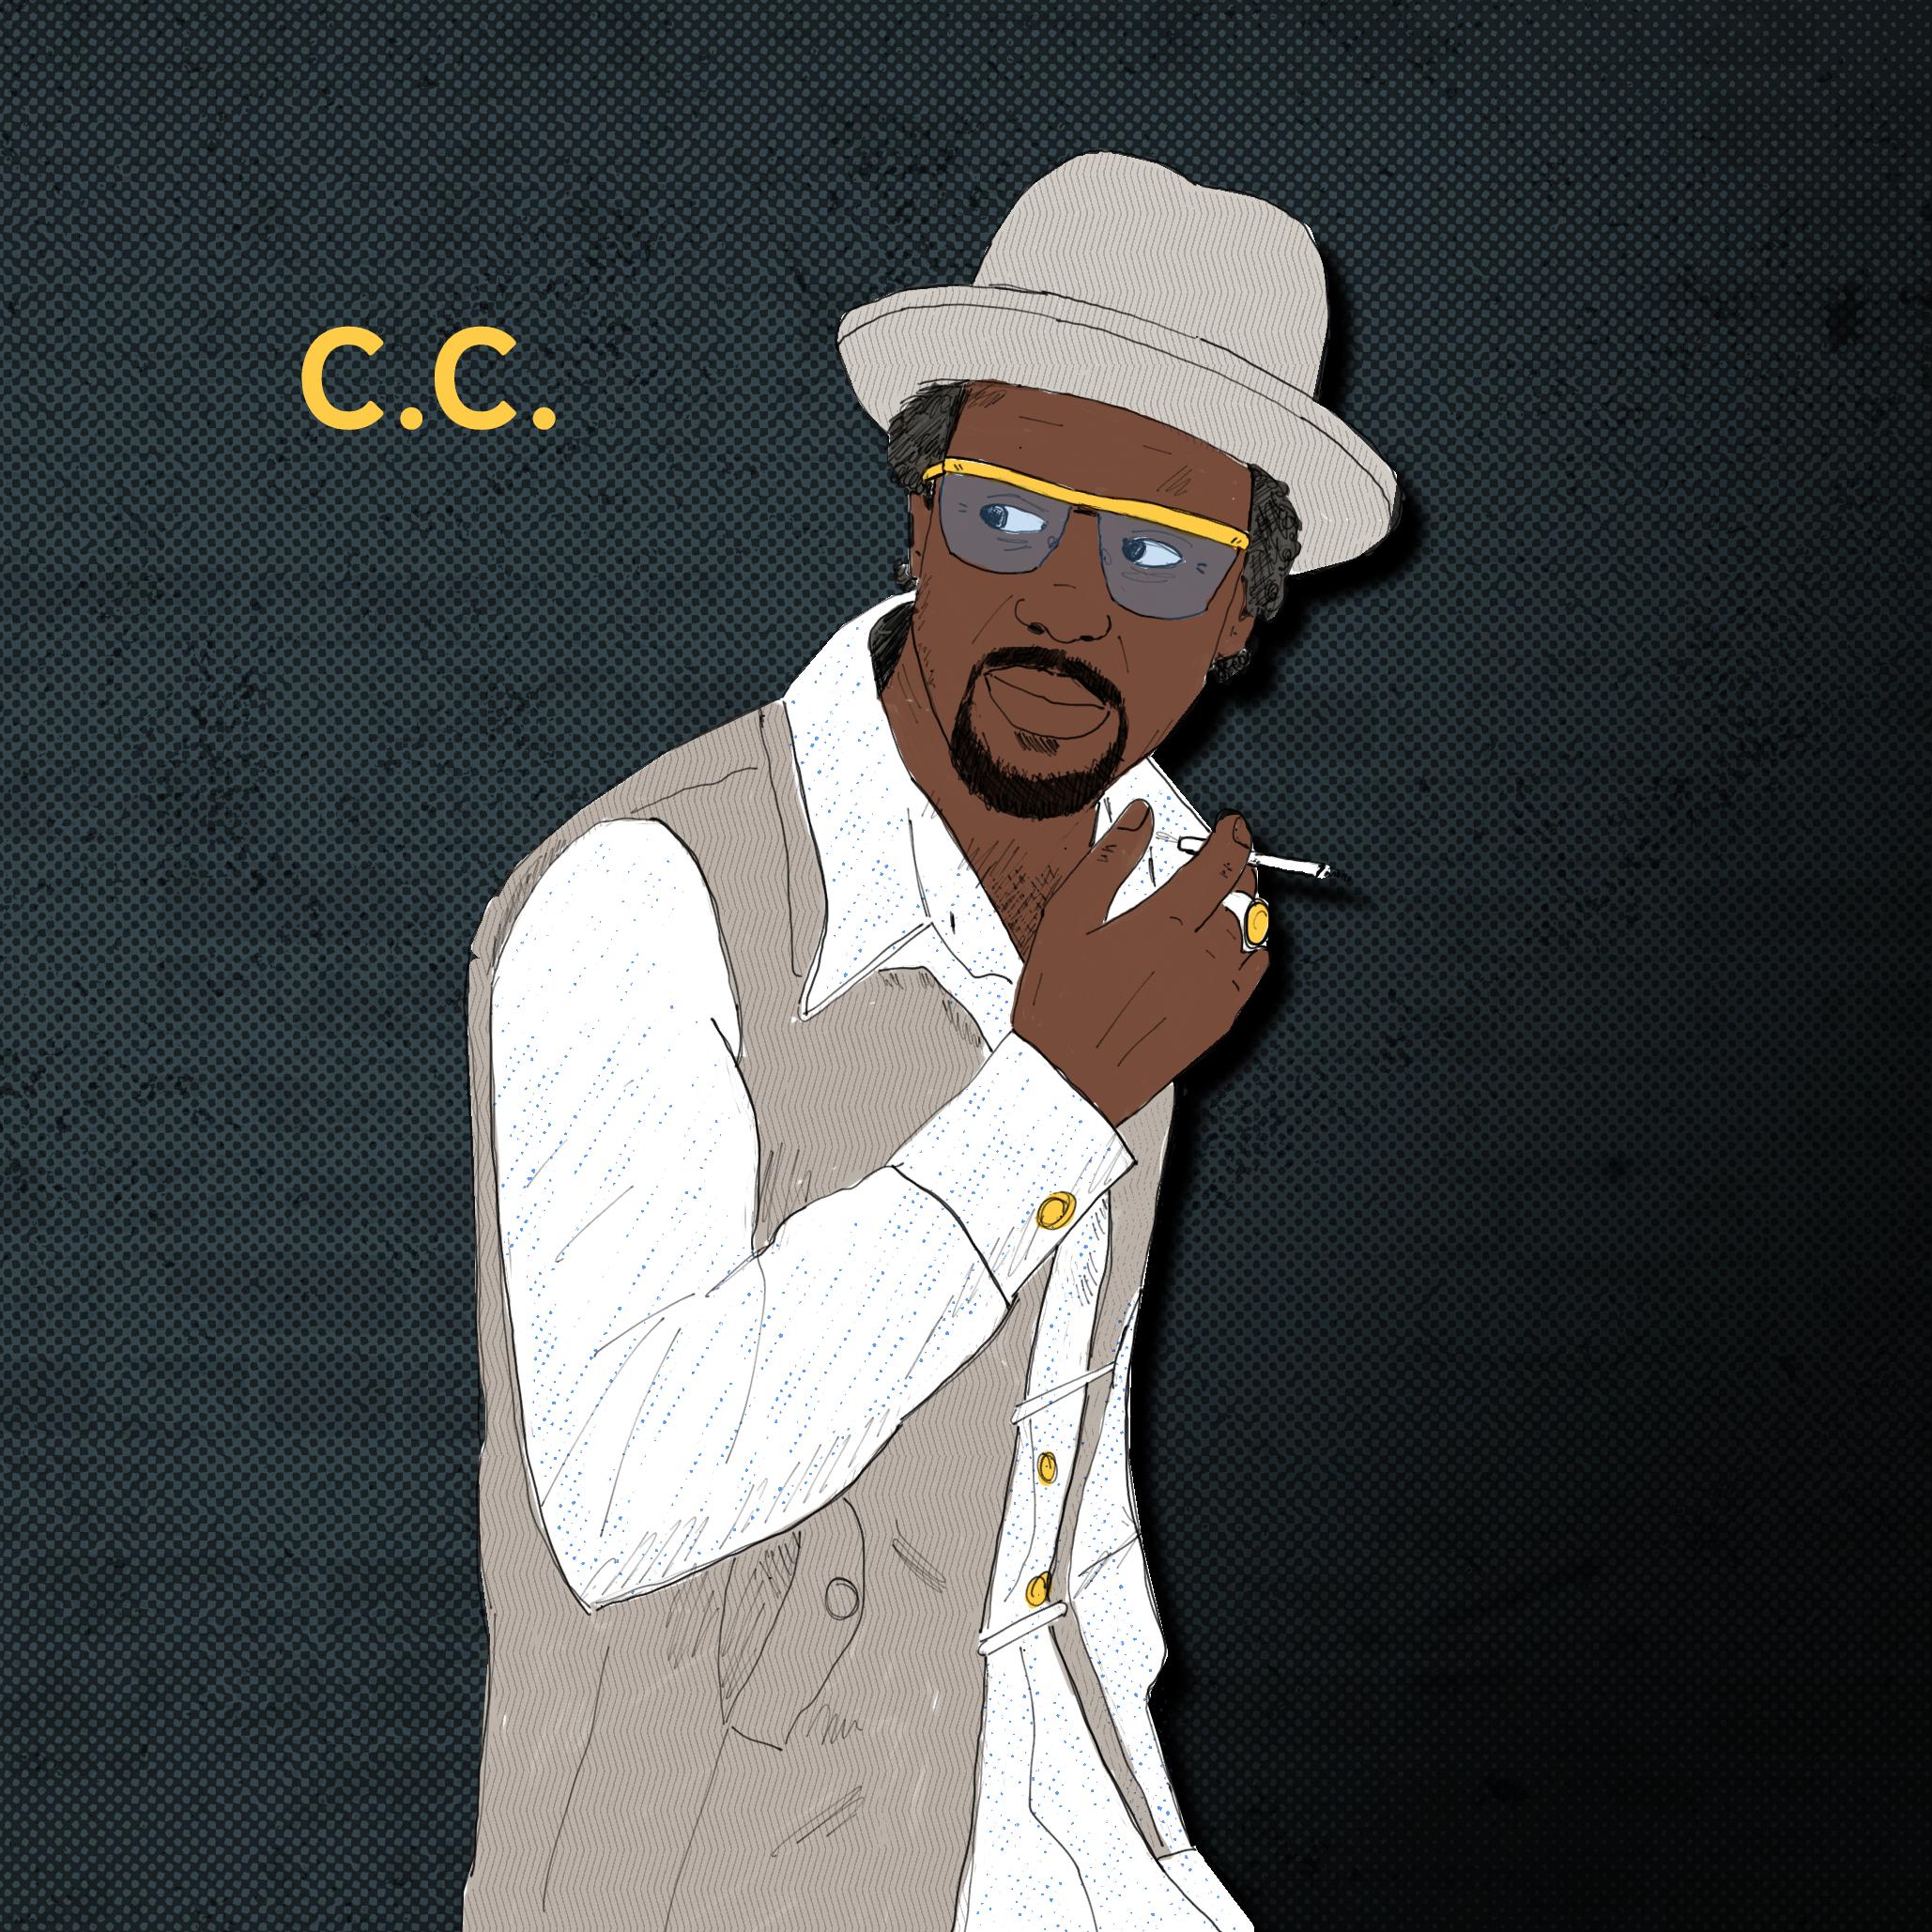 cc-the-deuce.jpg